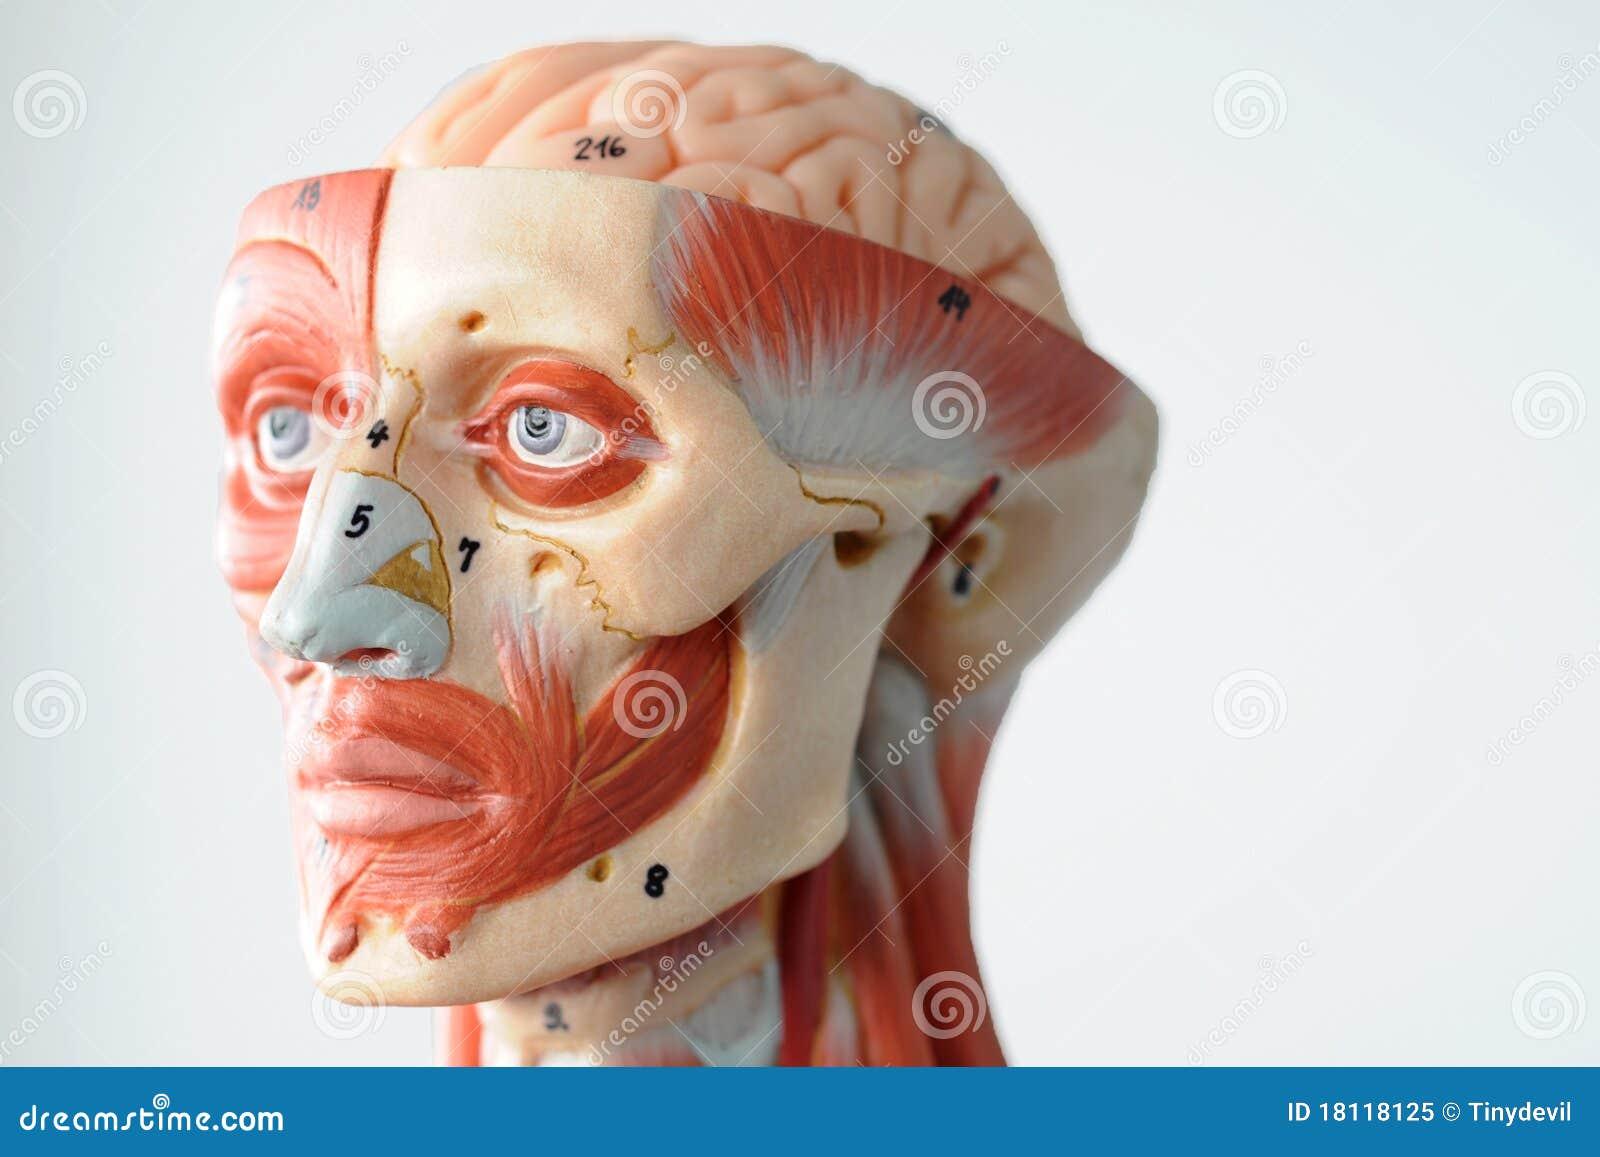 Human Side Face Anatomy Face Human Anatomy Roy...